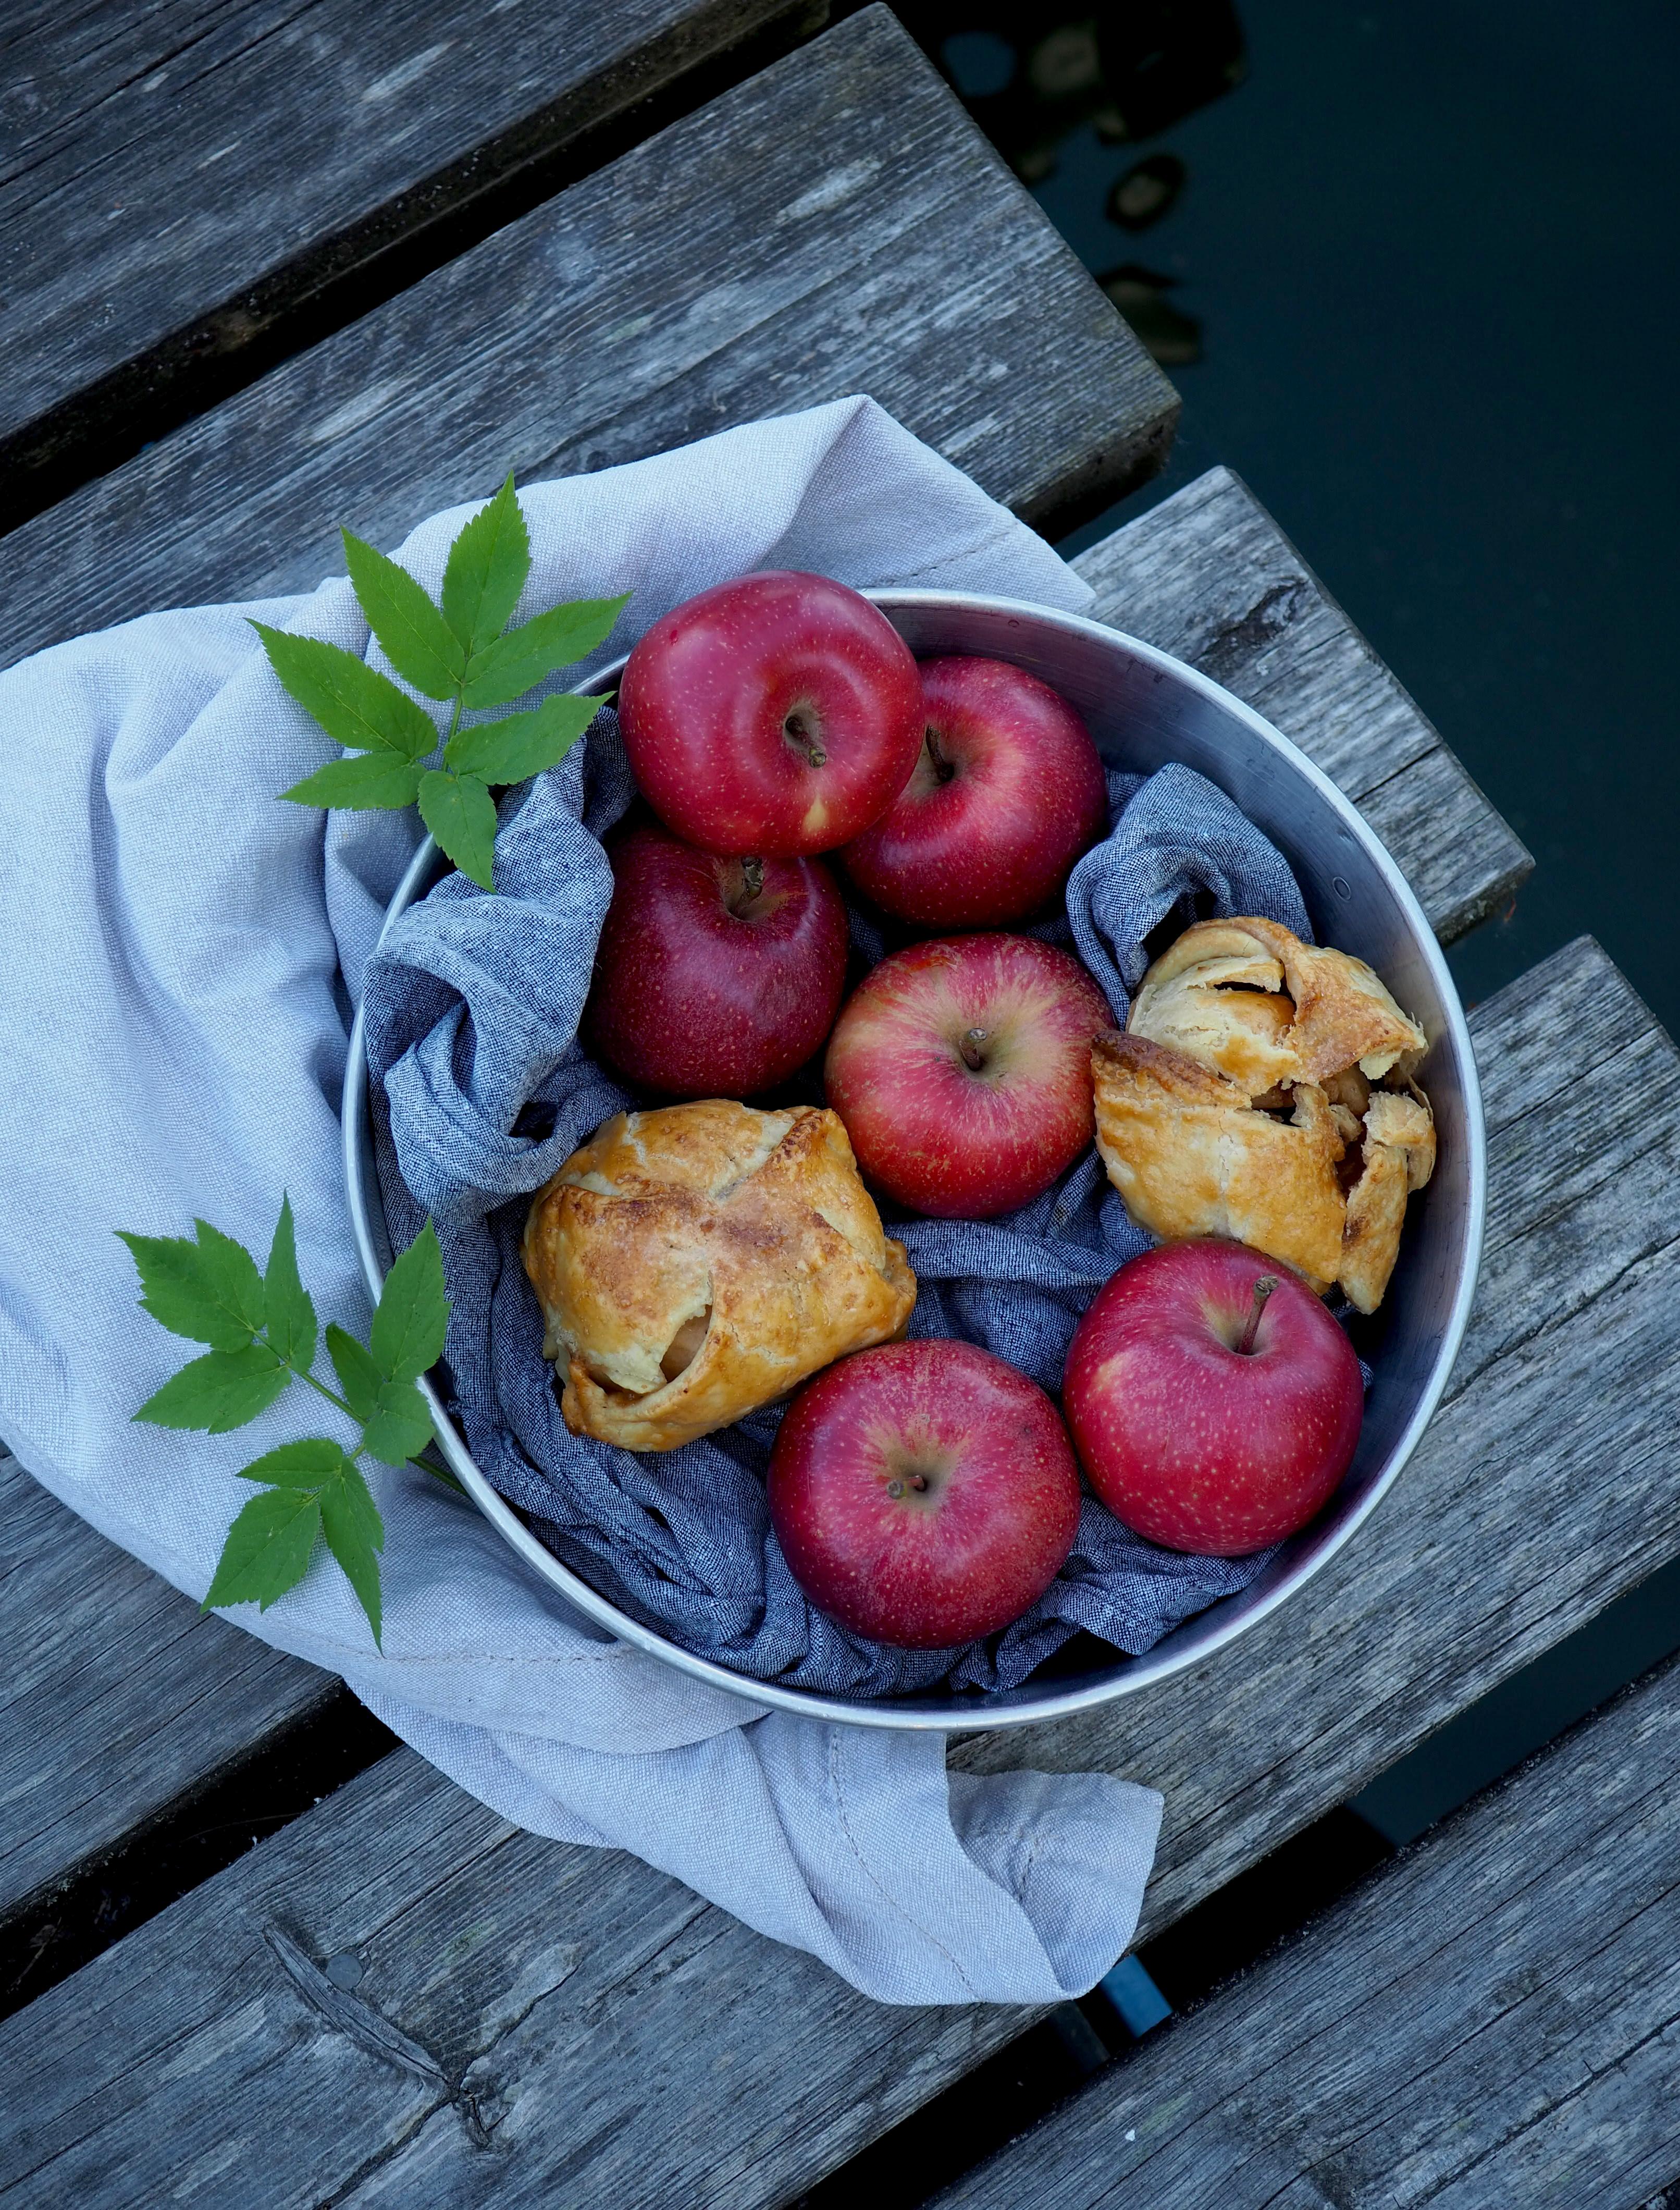 Omenanyytit – Juhannuskalenteri luukku 7